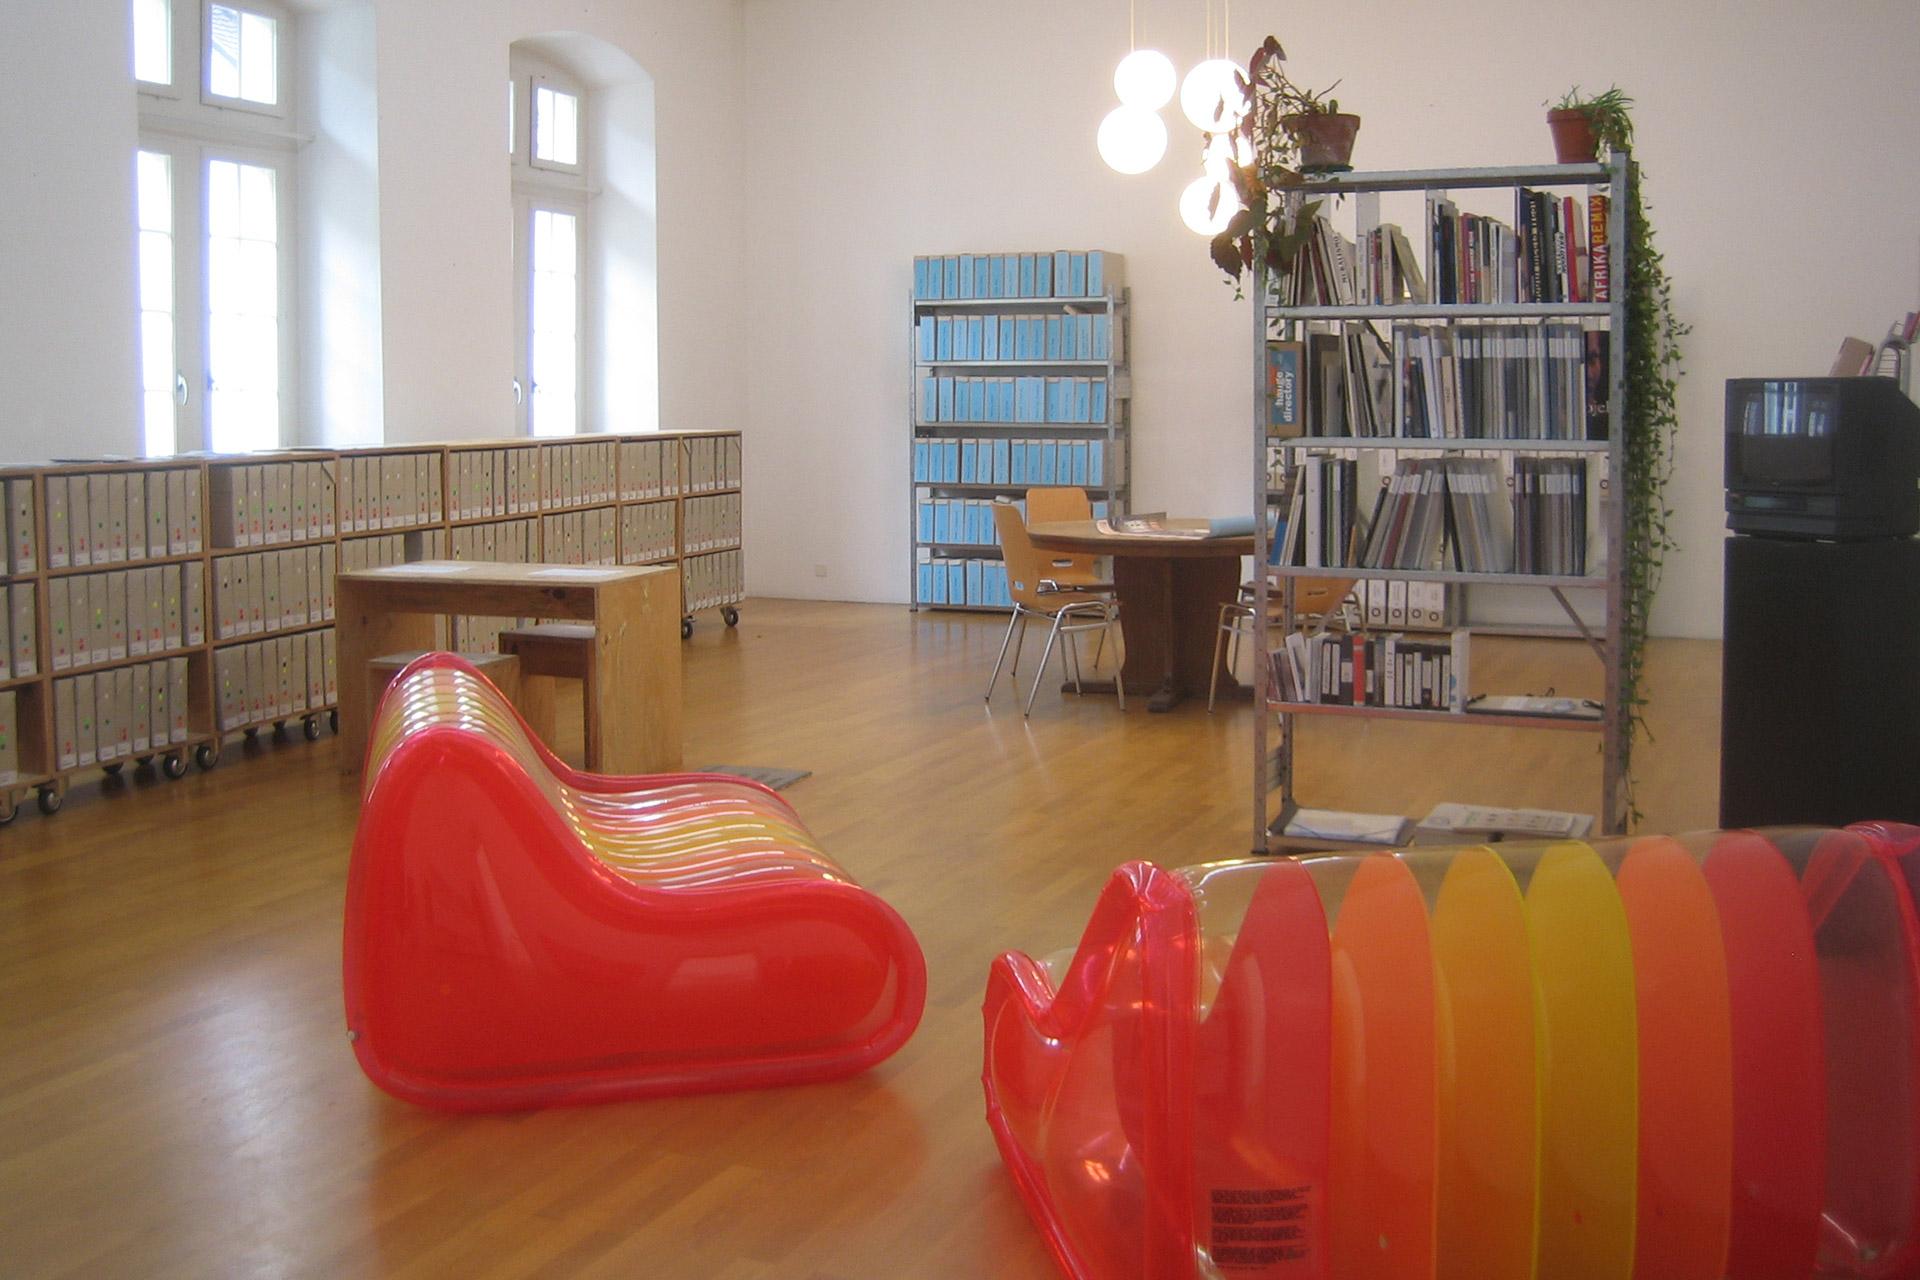 Werk-Dokumentation-Kunsthalle-Winterthur-2007-1.jpg